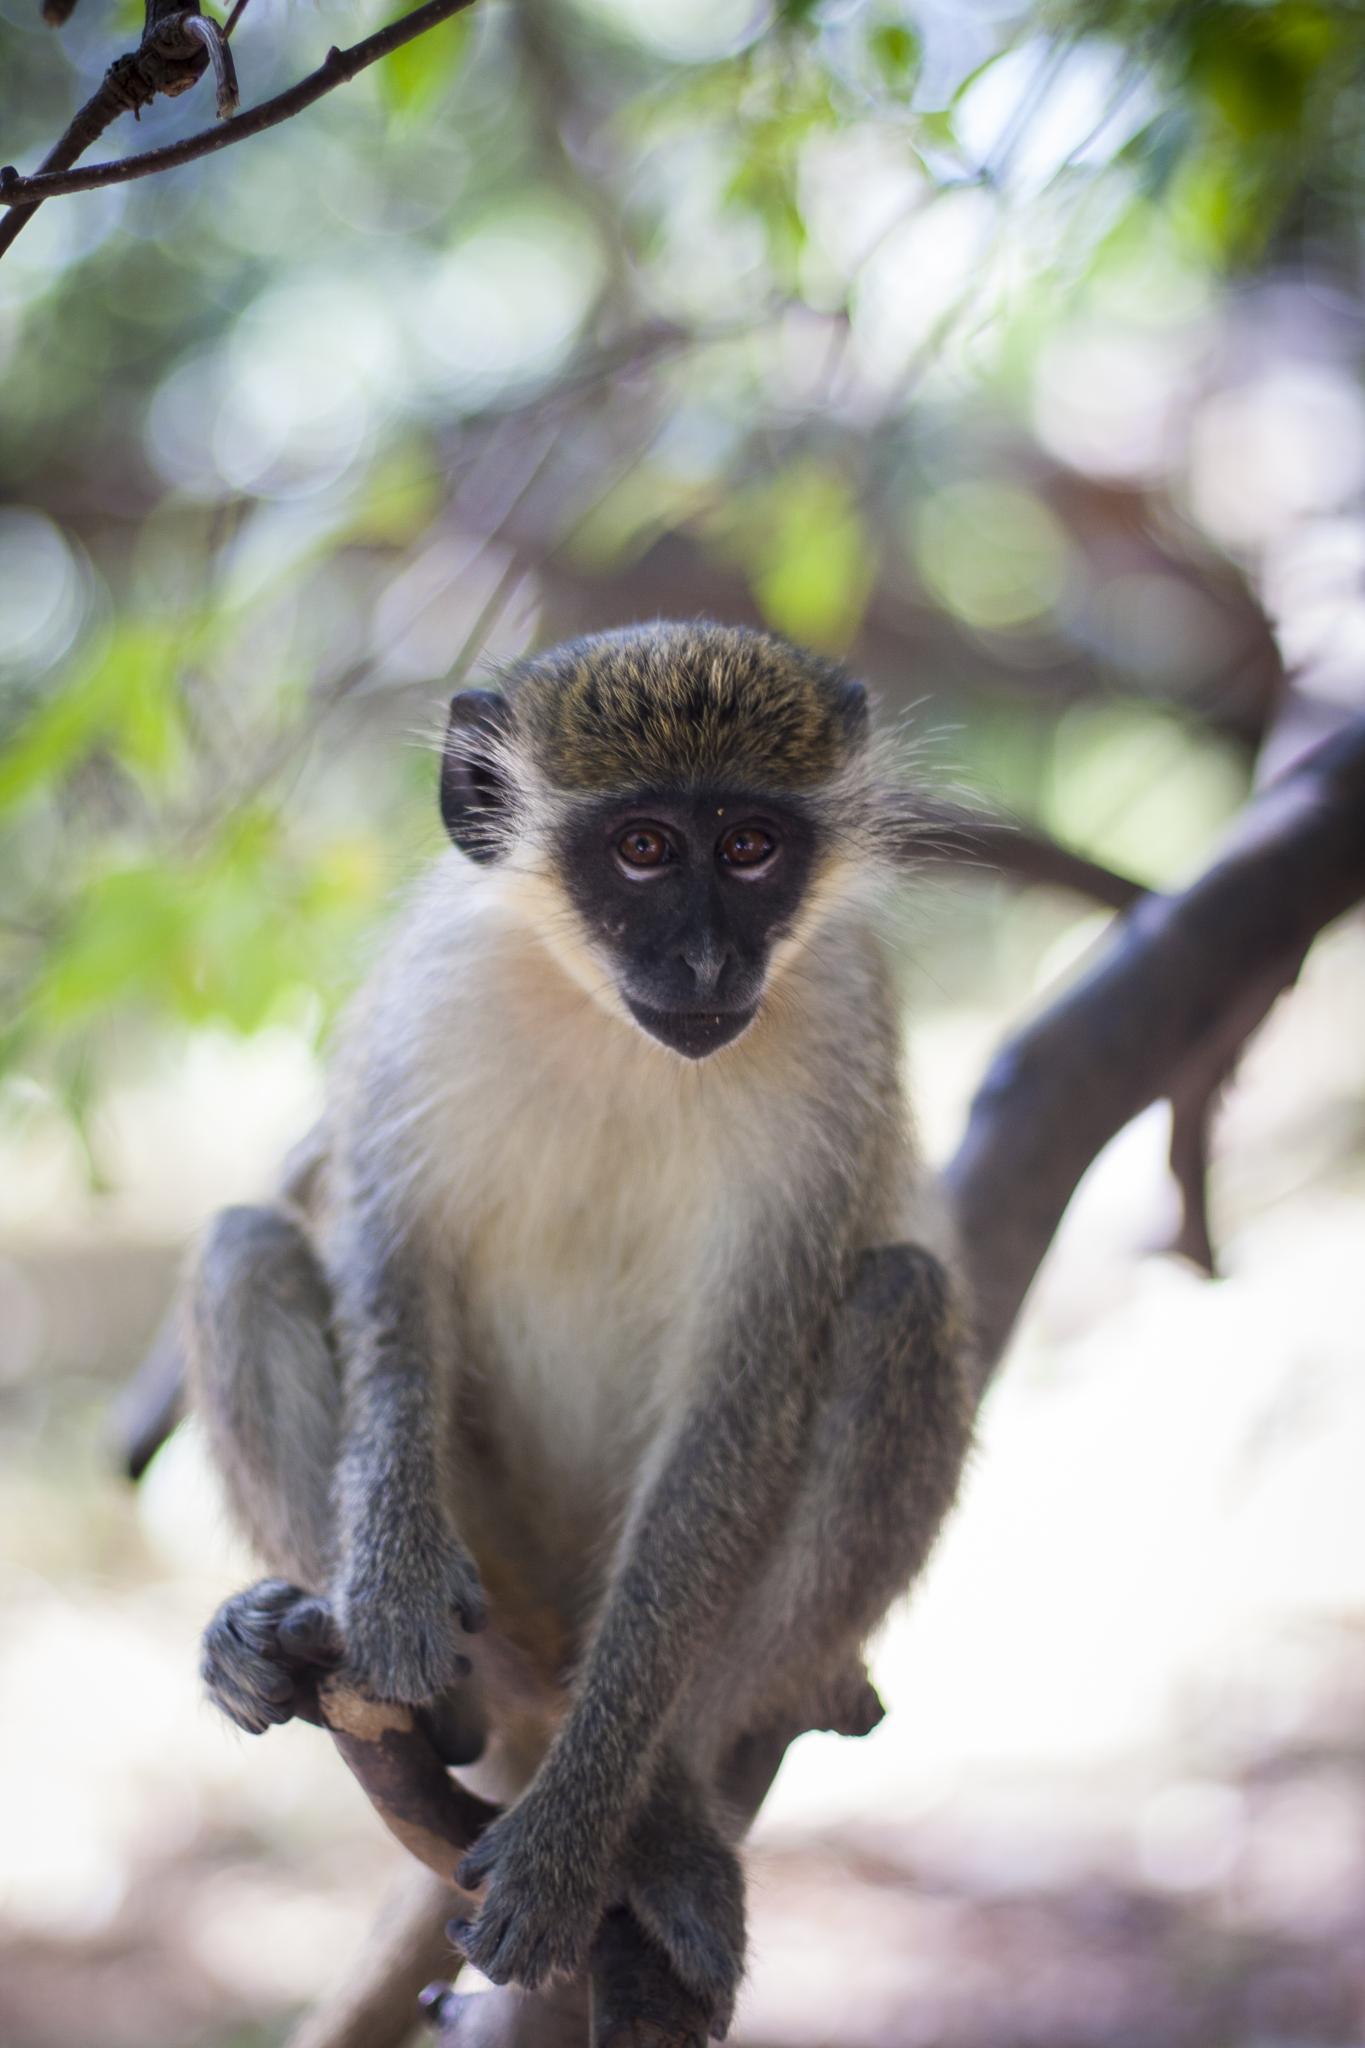 Green Monkey in Gambia by Rafal Krzysiak